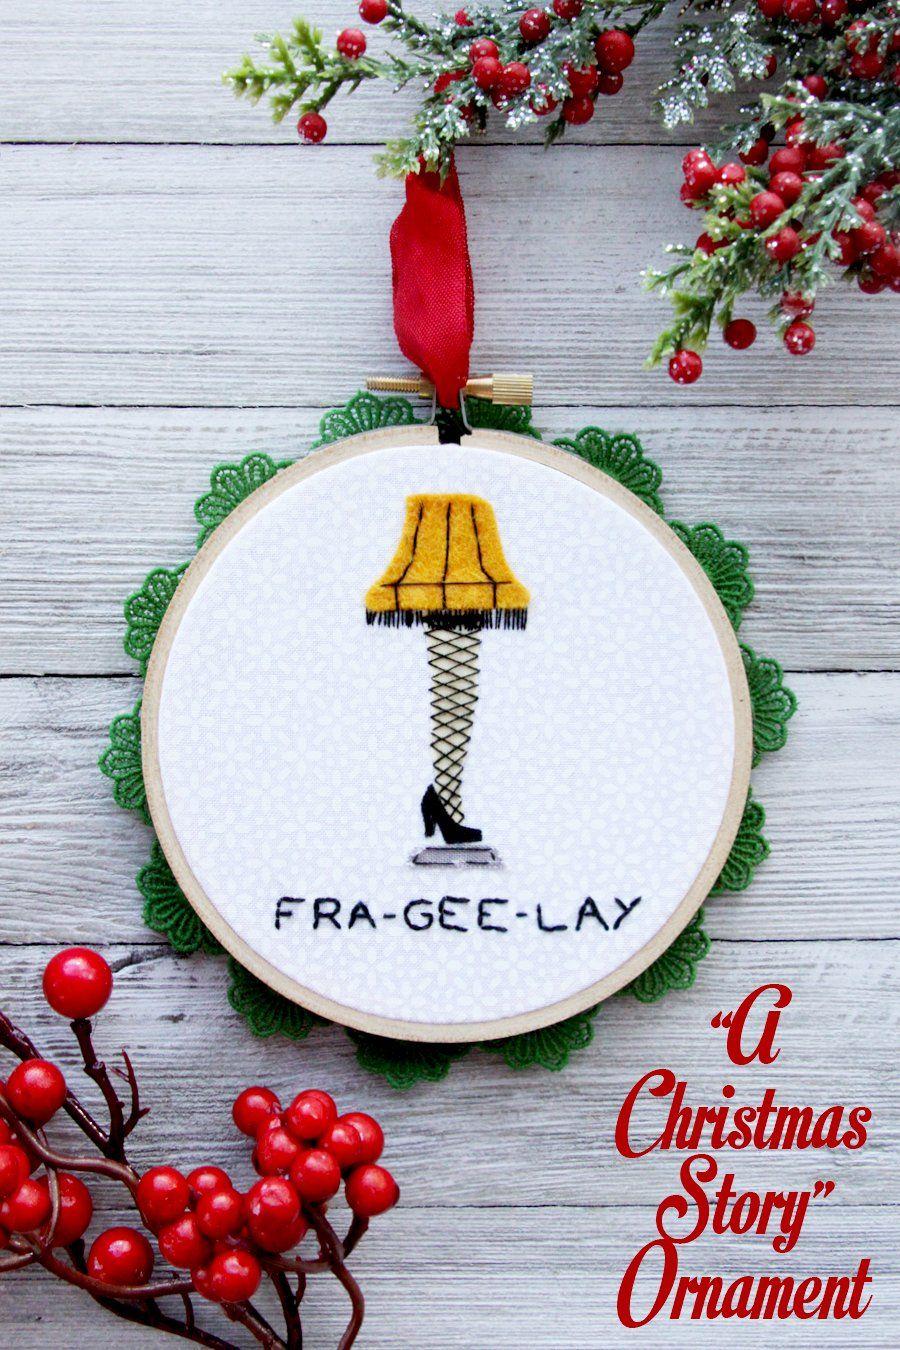 A Christmas Story Leg Lamp Ornament Christmas Story Leg Lamp A Christmas Story Christmas Ornaments